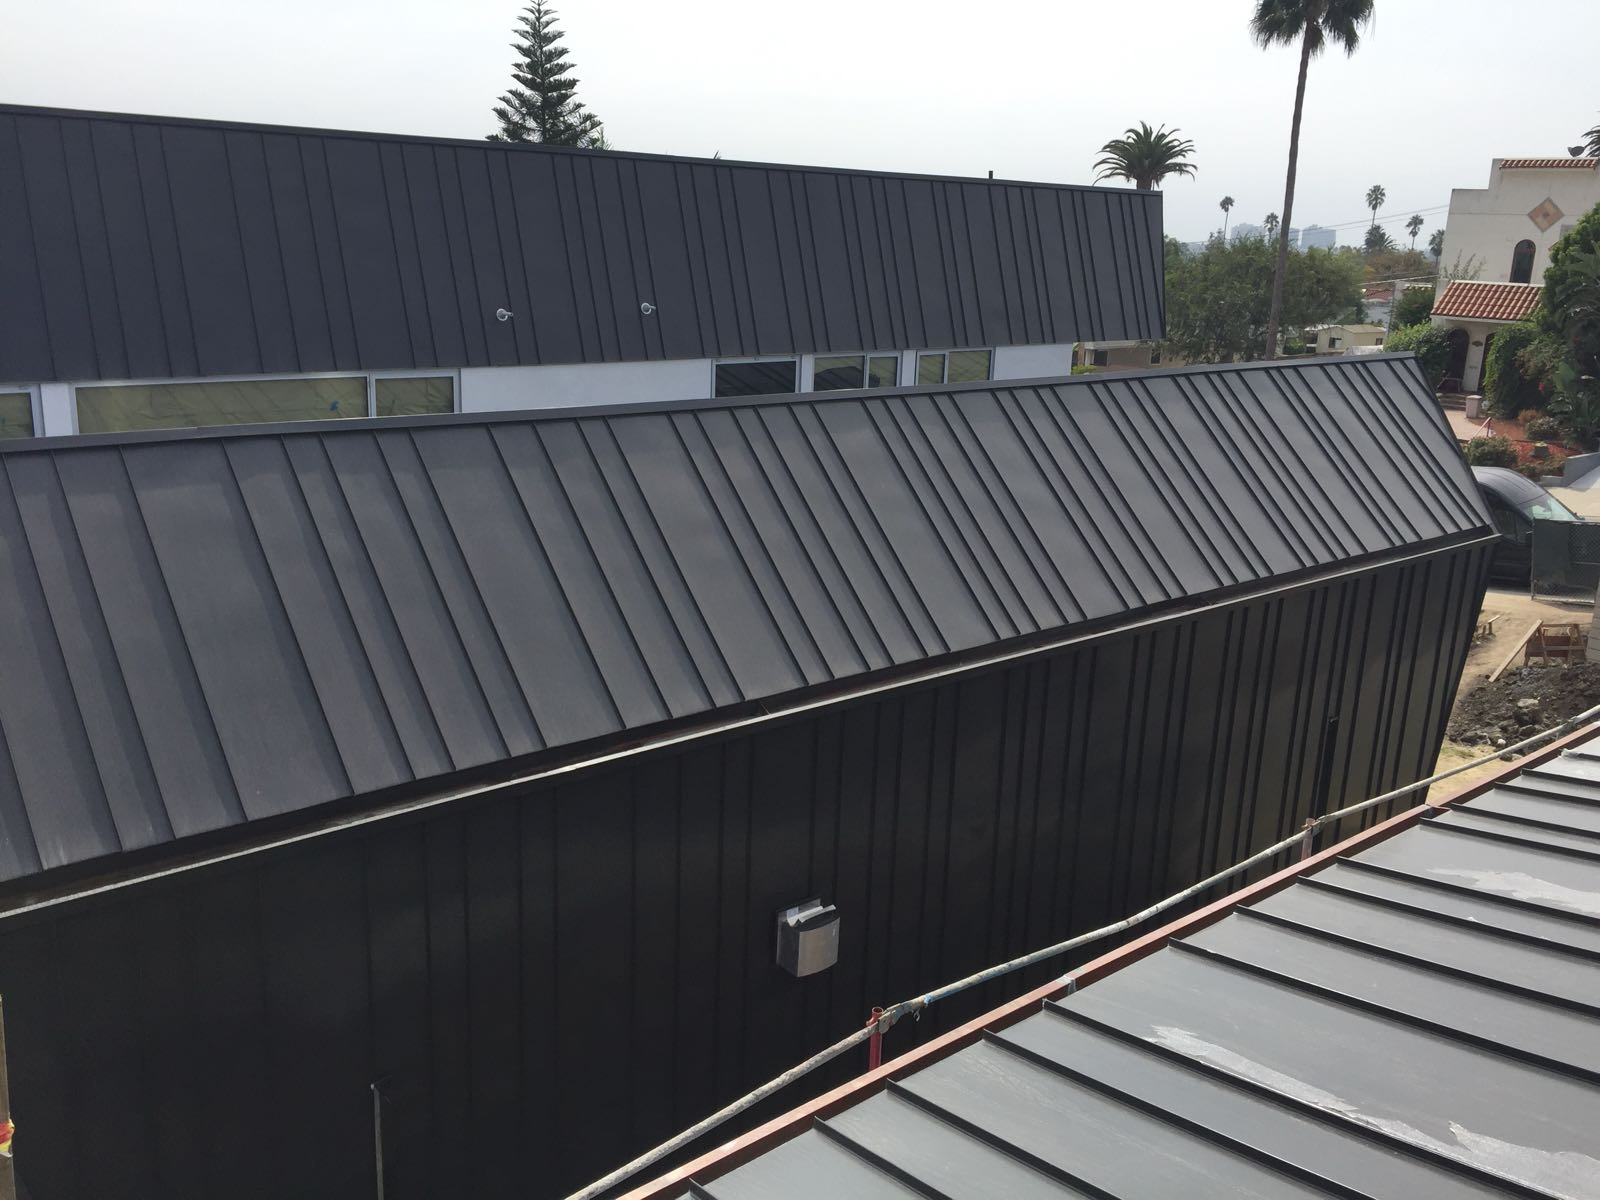 Custom Standing Seam Metal Roof And Siding Venice Beach